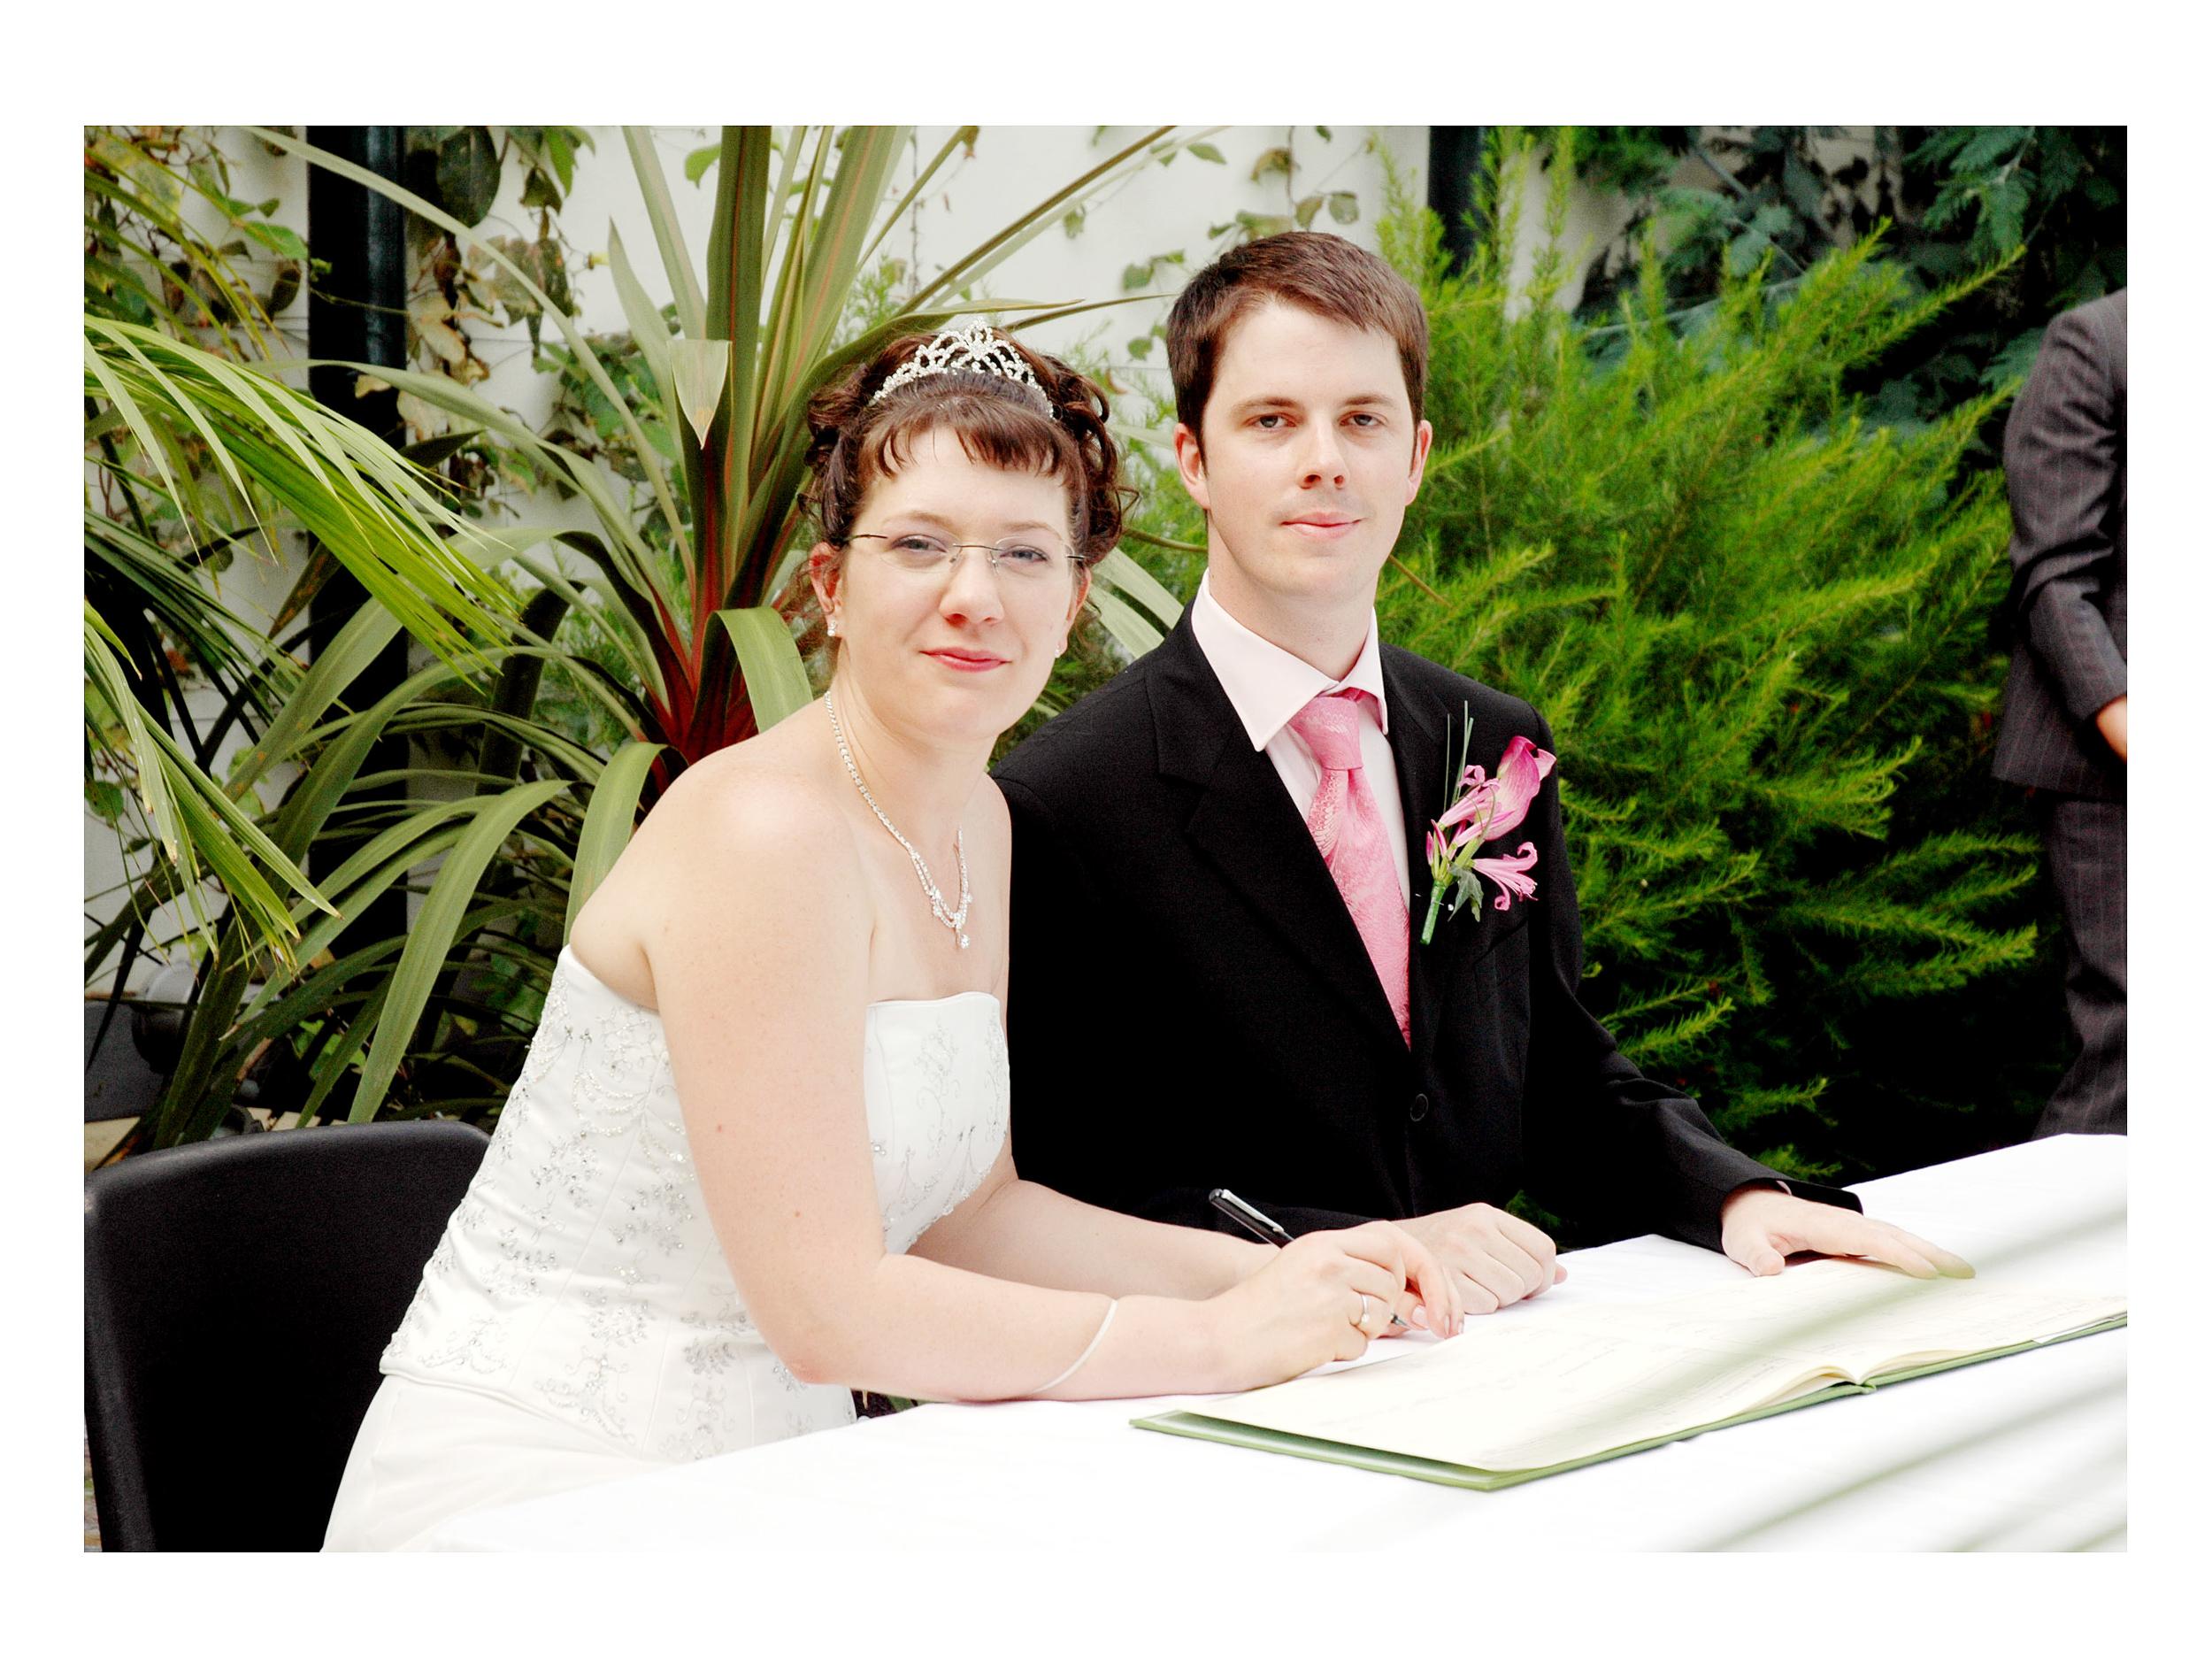 REPORTAGE-WEDDING-PHOTOGRAPHY-SET-UK-20.jpg